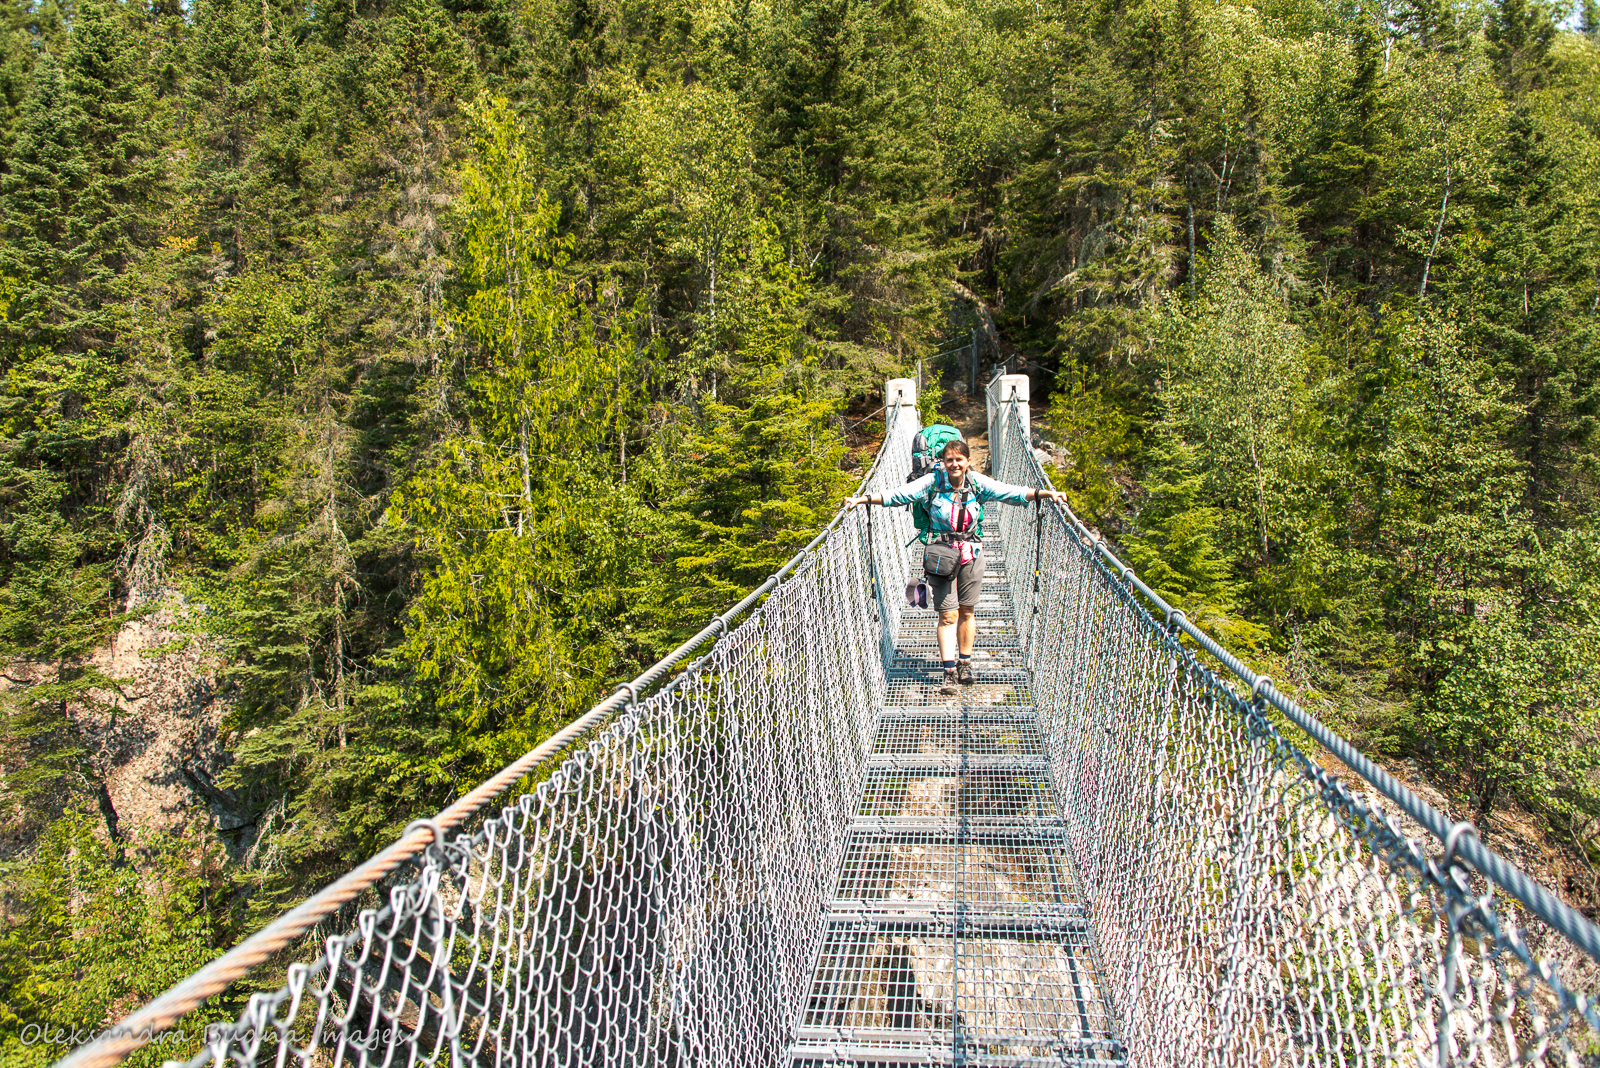 crossing suspension bridge over White River in Pukaskwa